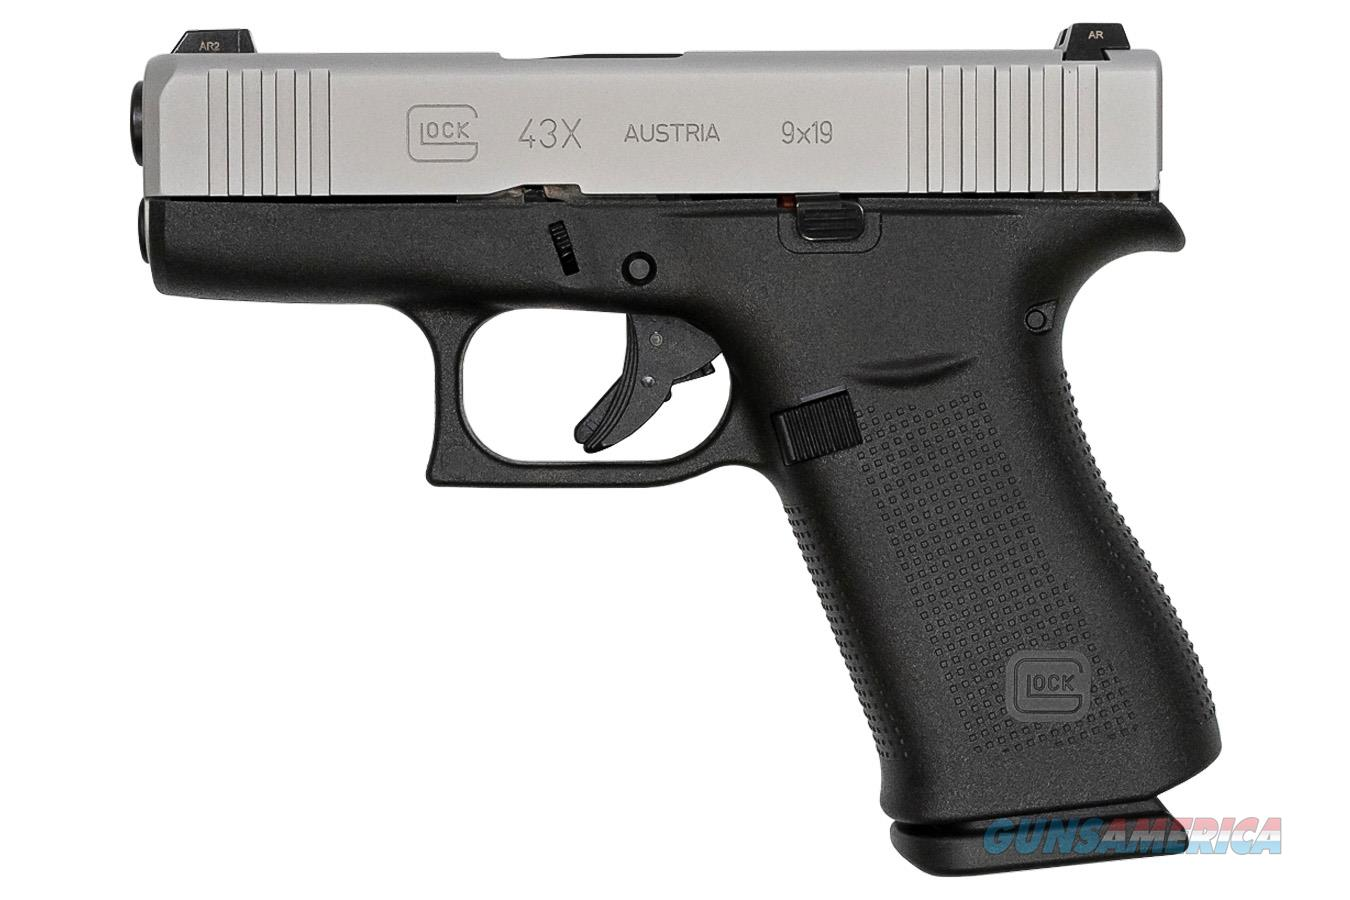 "Glock G43X 9mm Luger 3.41"" Black/Silver PX435SL701   Guns > Pistols > Glock Pistols > 43/43X"